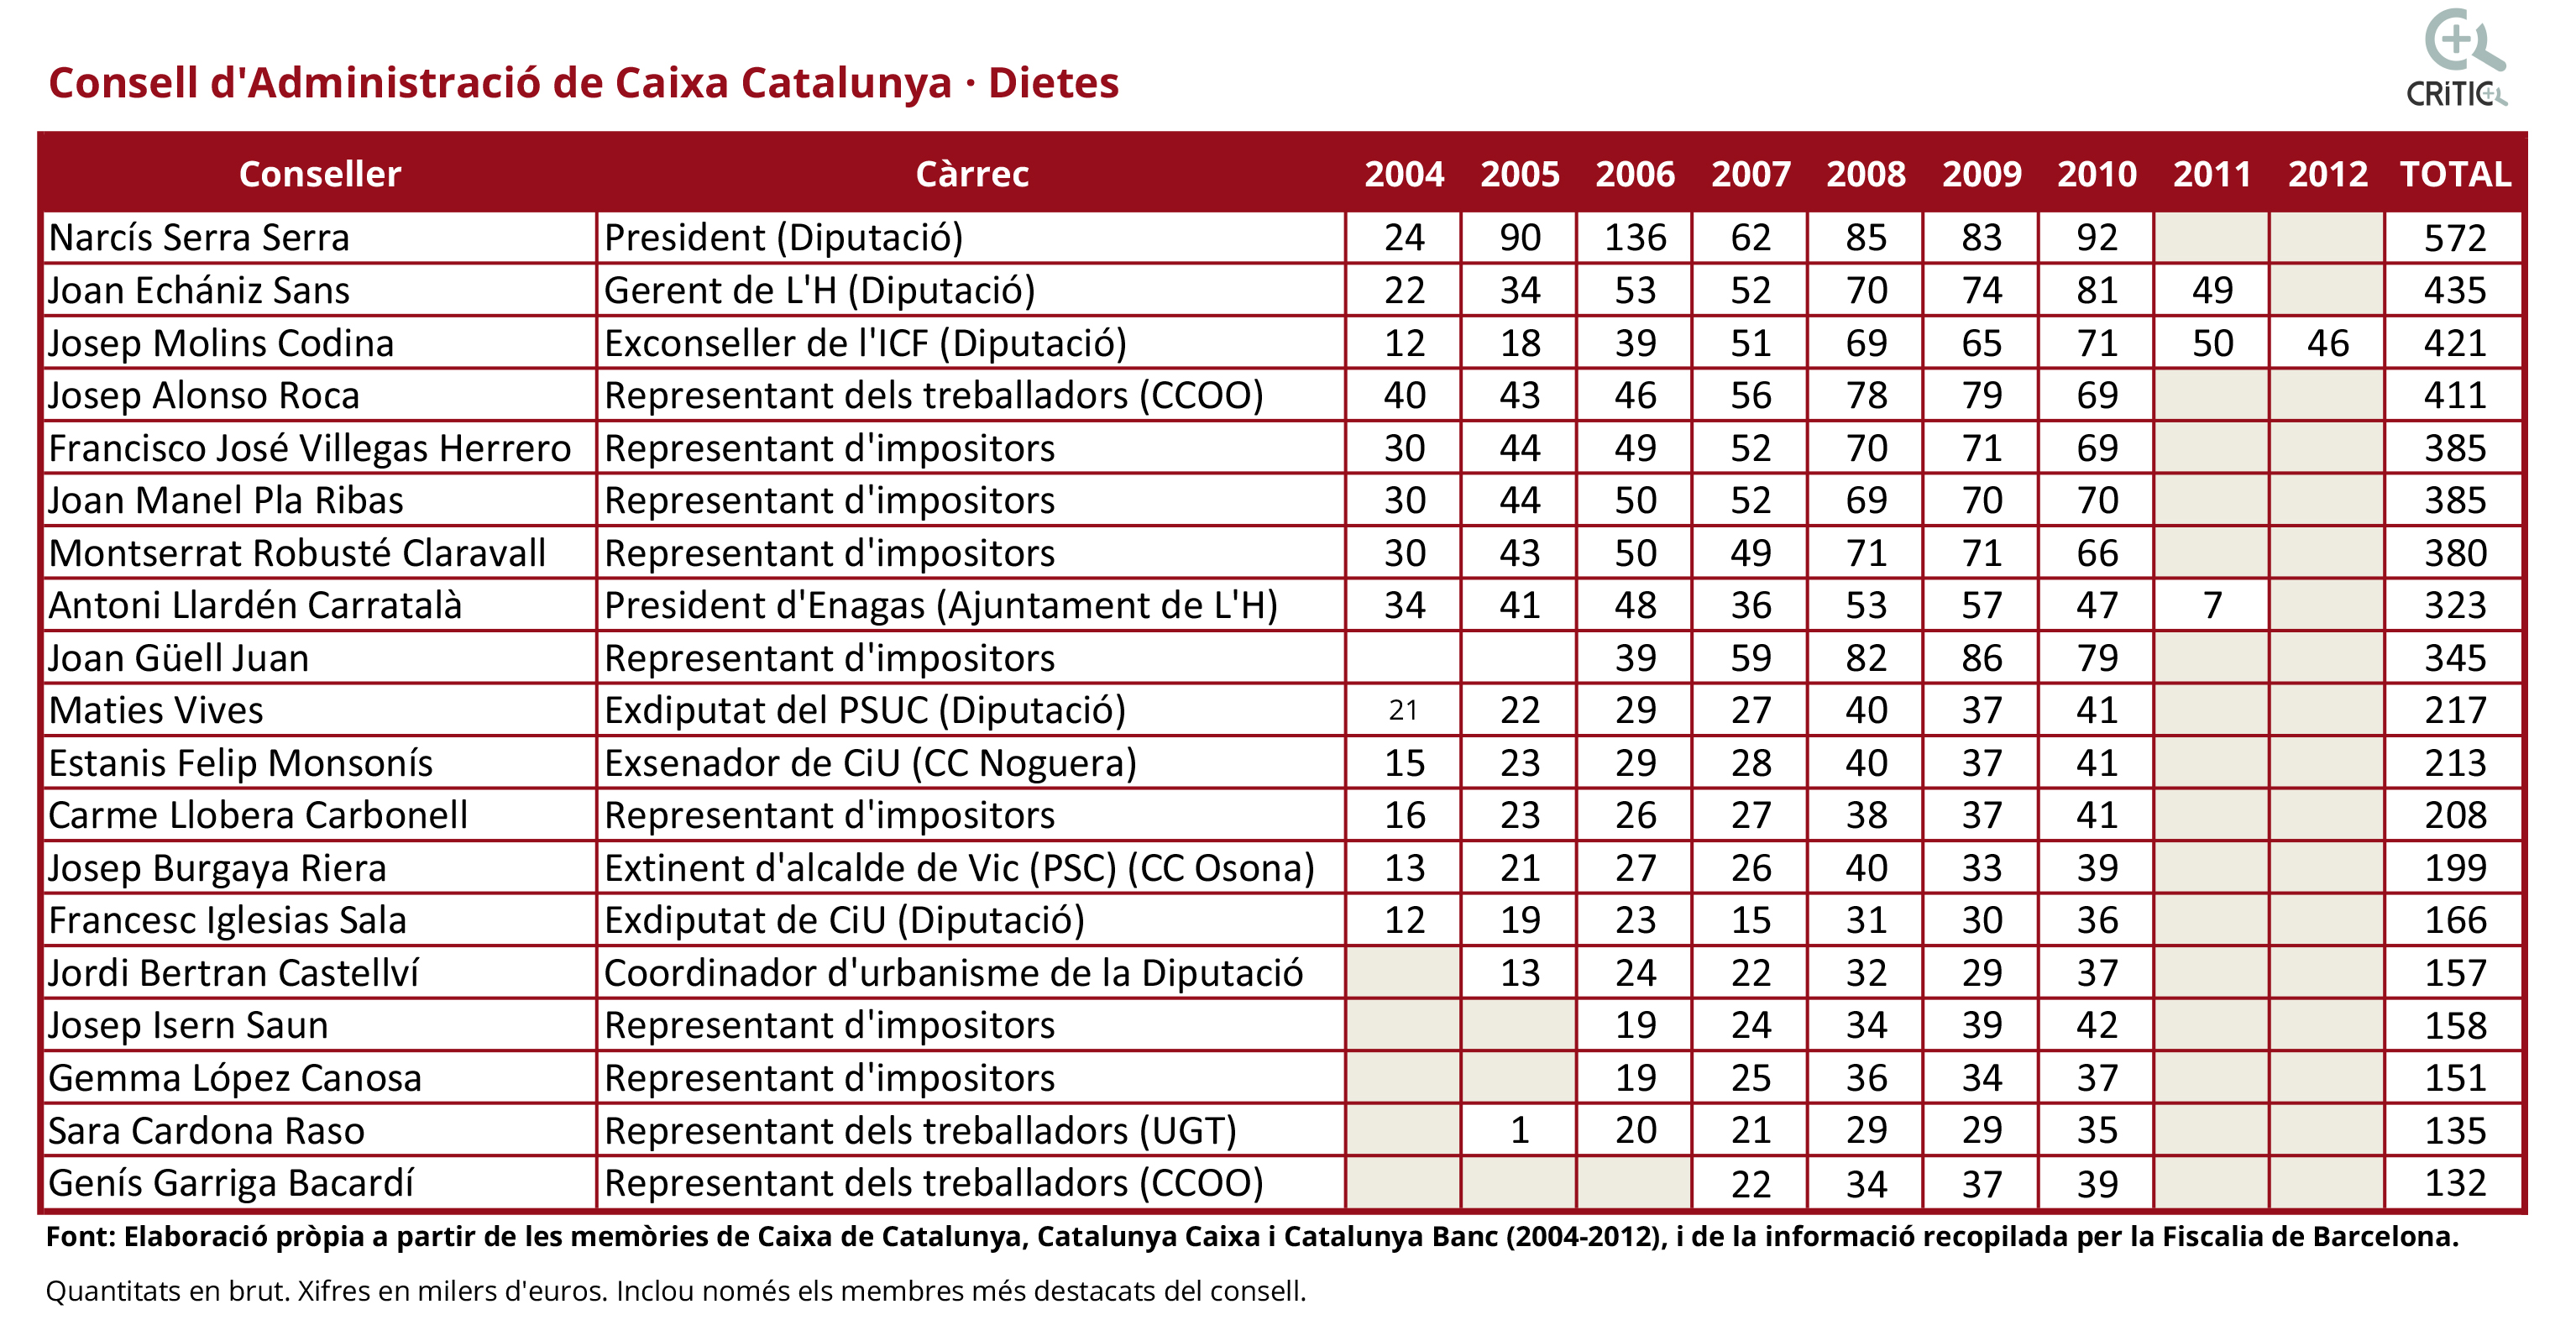 dietes CAT CAIXA OK.xlsx